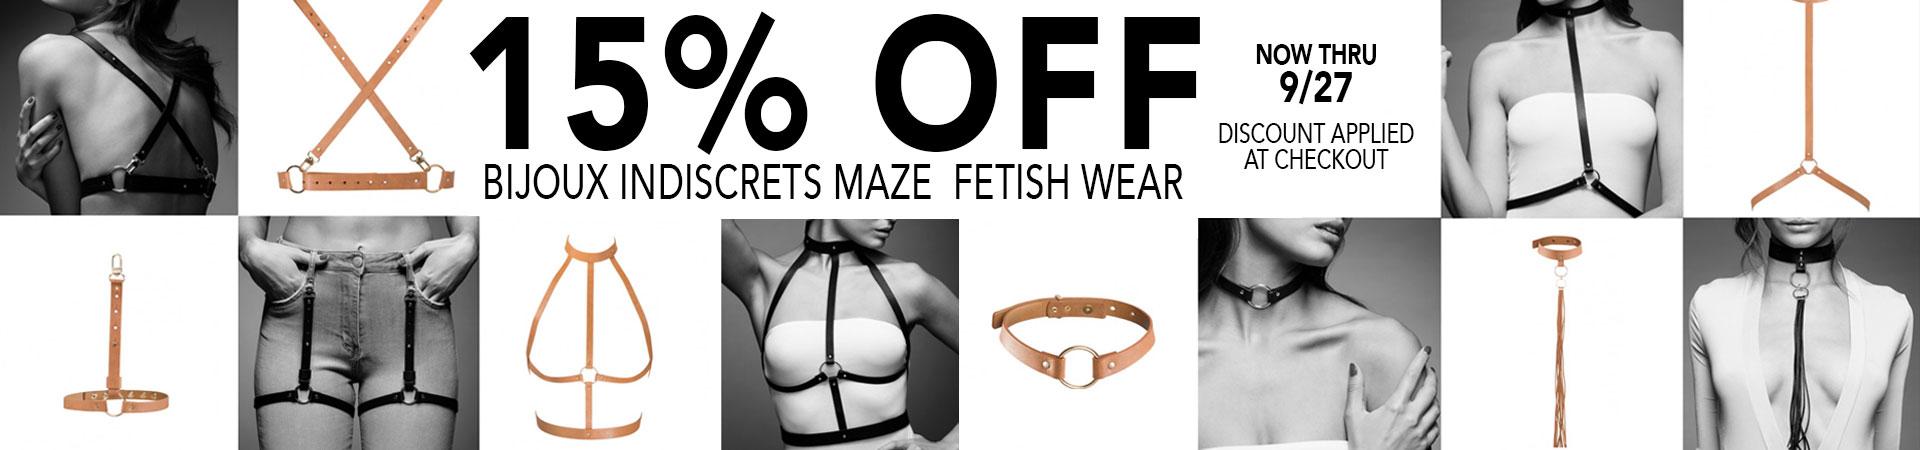 15% Bijoux Indiscrets Maze Fetish Wear - Now Thru 9/27 - Discount Applied At Checkout